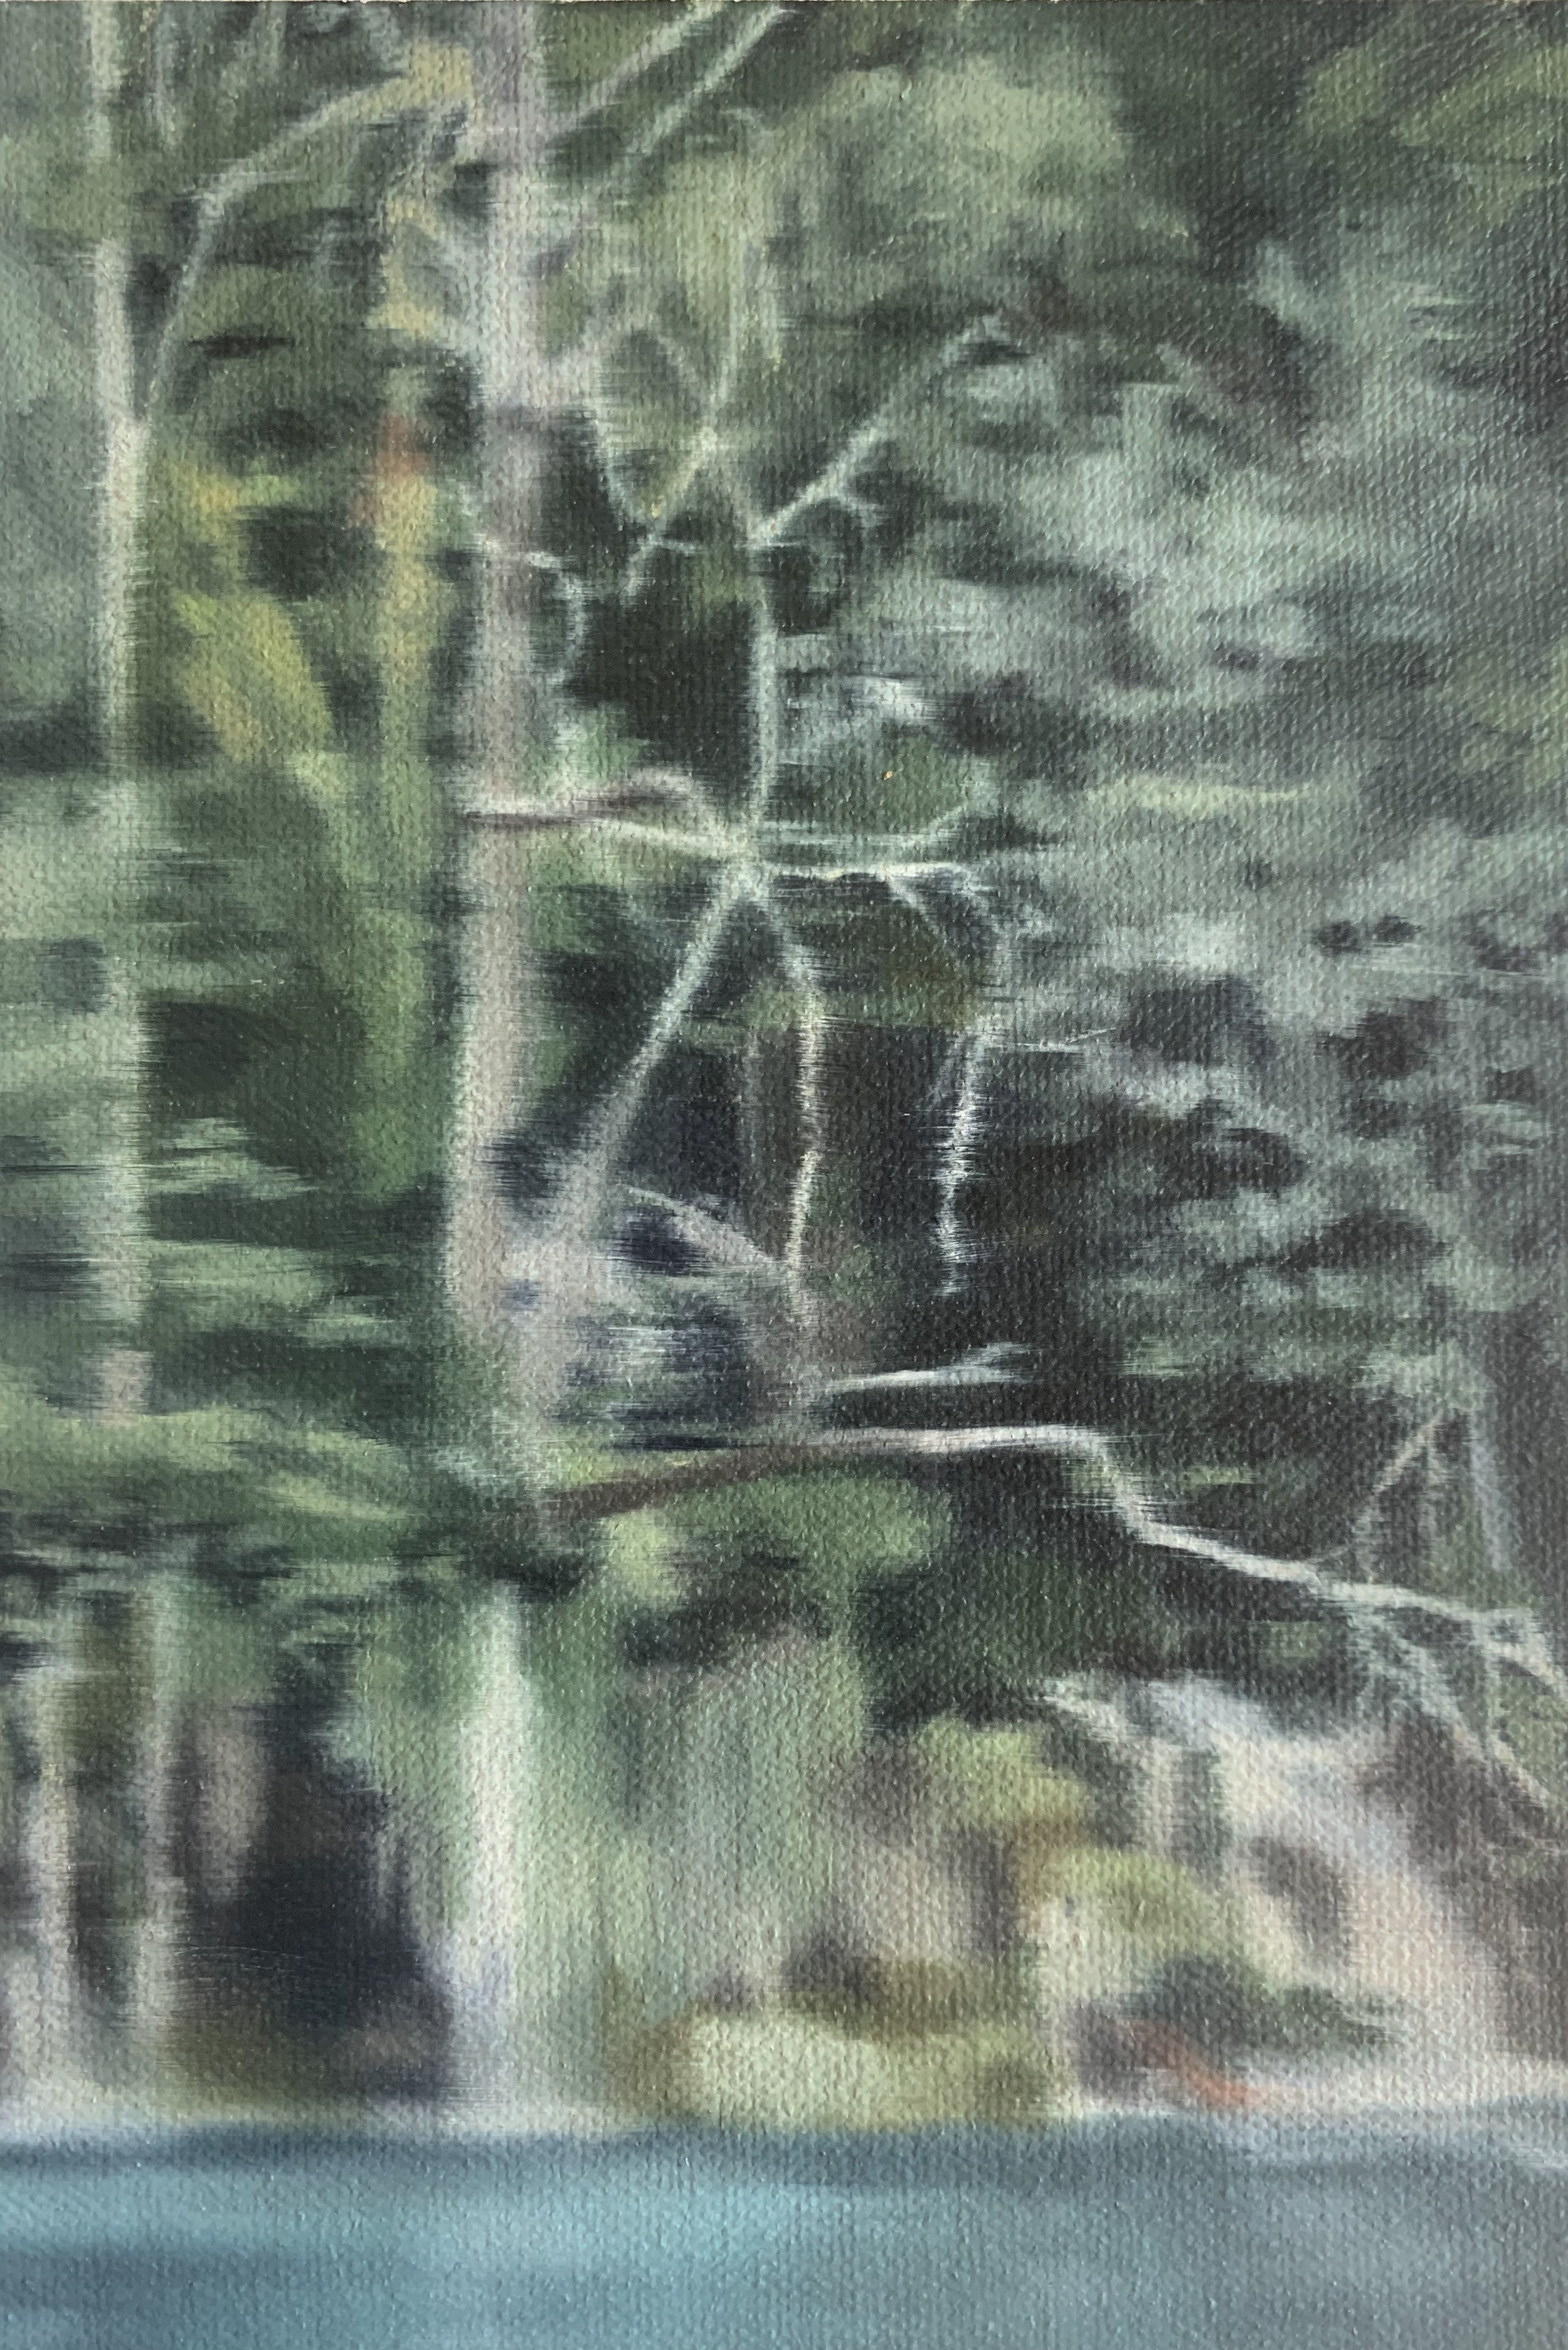 AMELIA CARROLL  image.92 , 2019 oil on canvas 18 x 12.5 cm